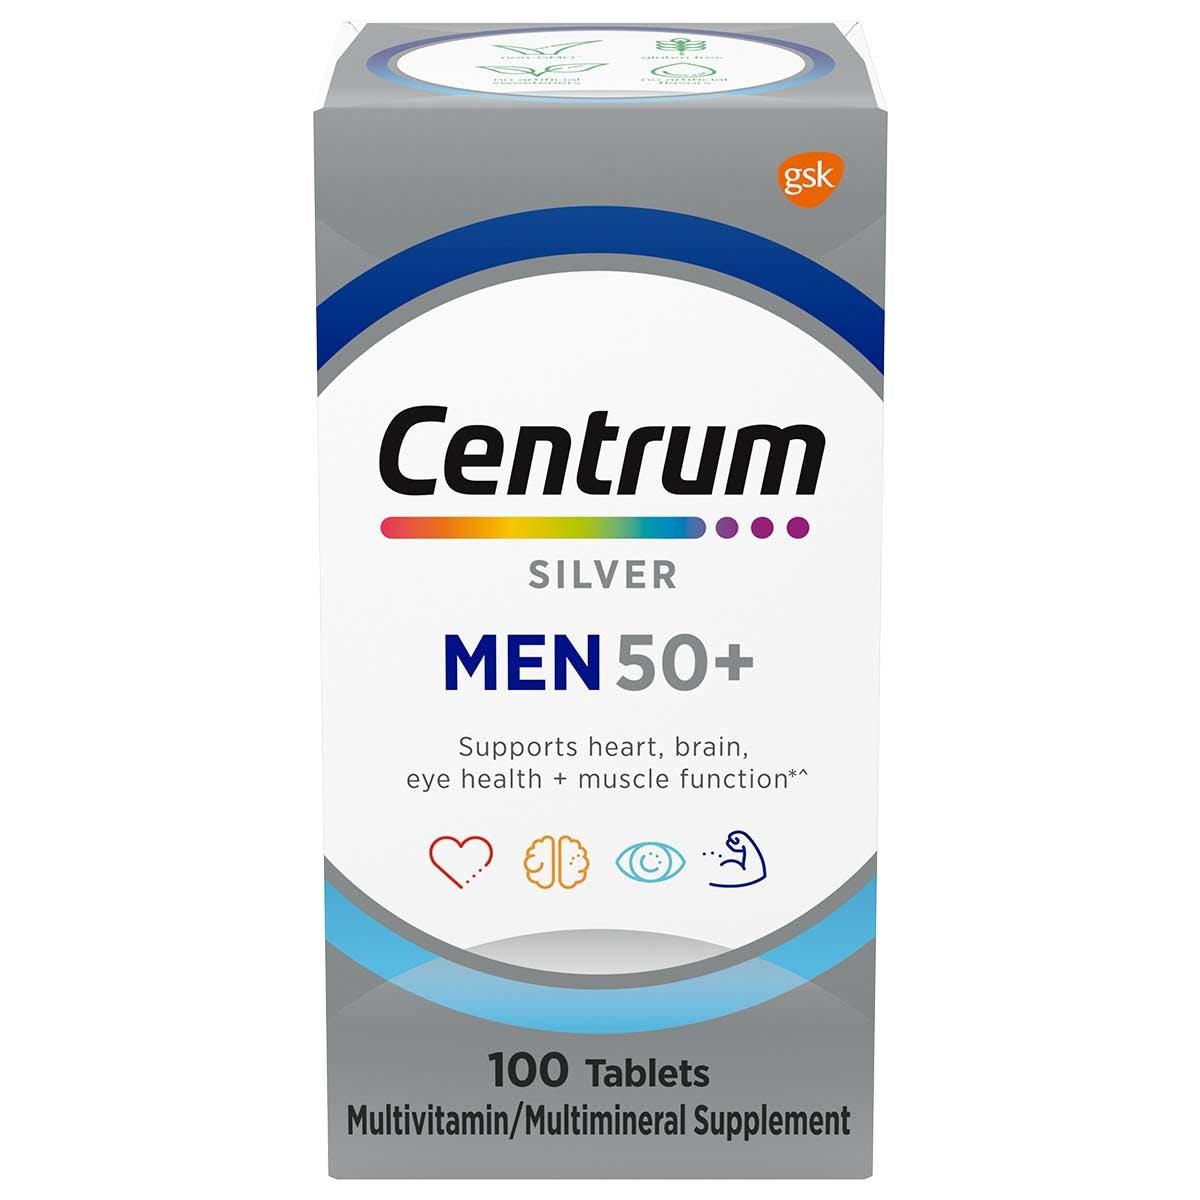 Centrum silver men multivitamins - previous packadging